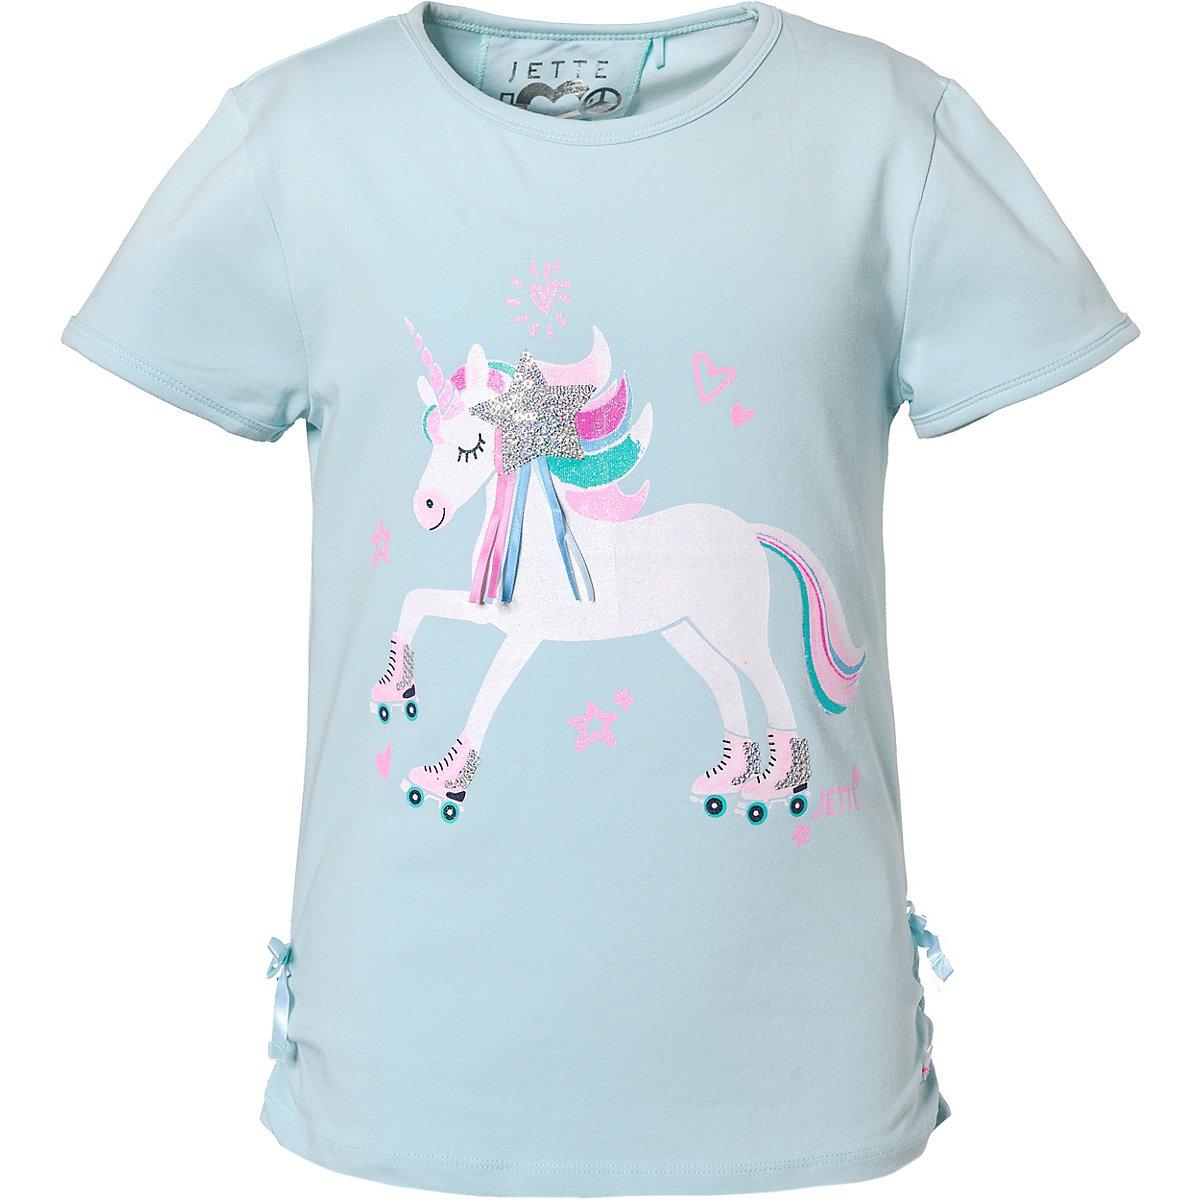 Einhorn Shirt Mädchen